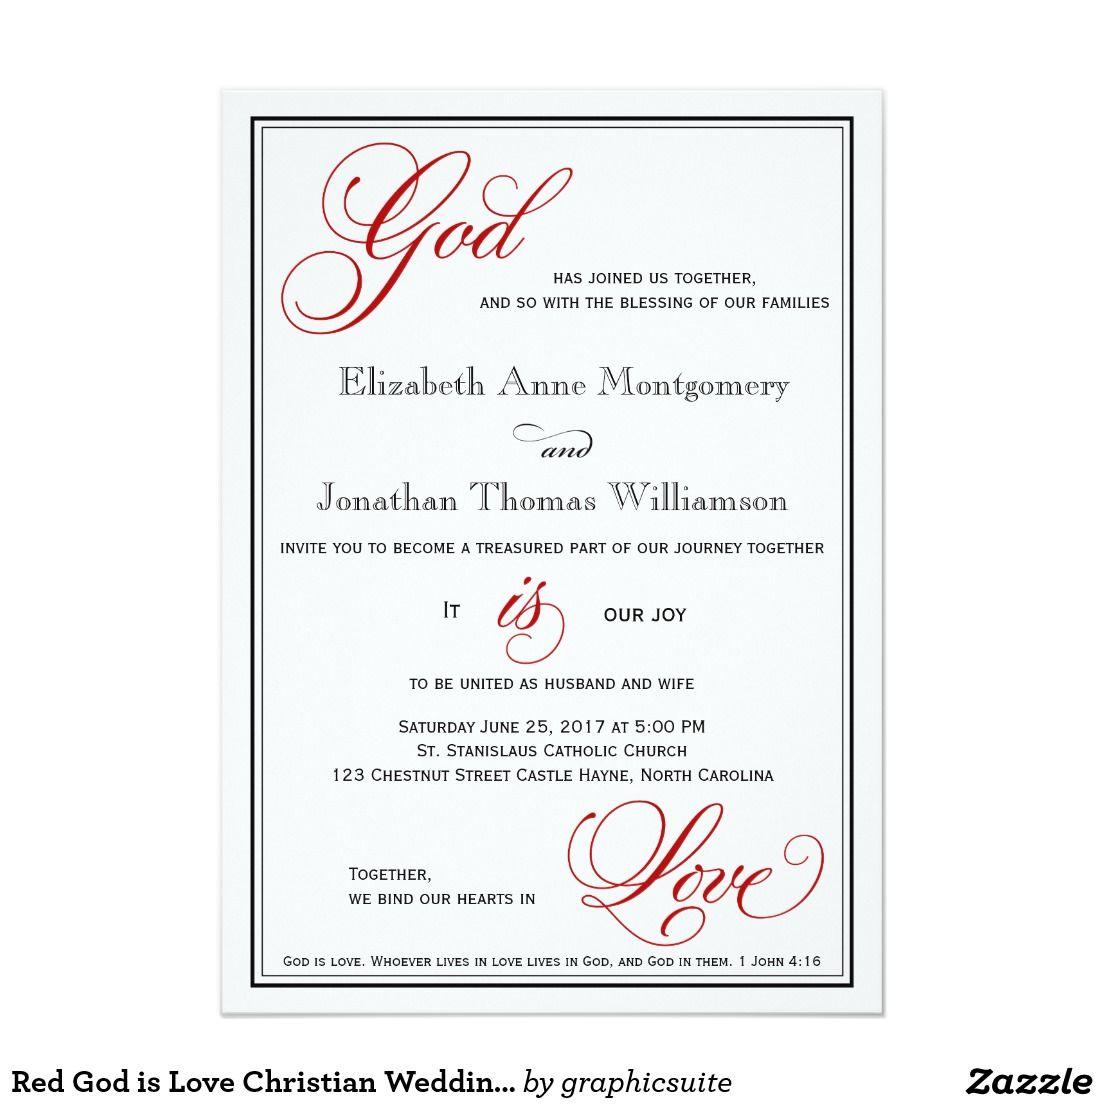 Christian Wedding Reception Ideas: Red God Is Love Christian Wedding Invitations In 2019